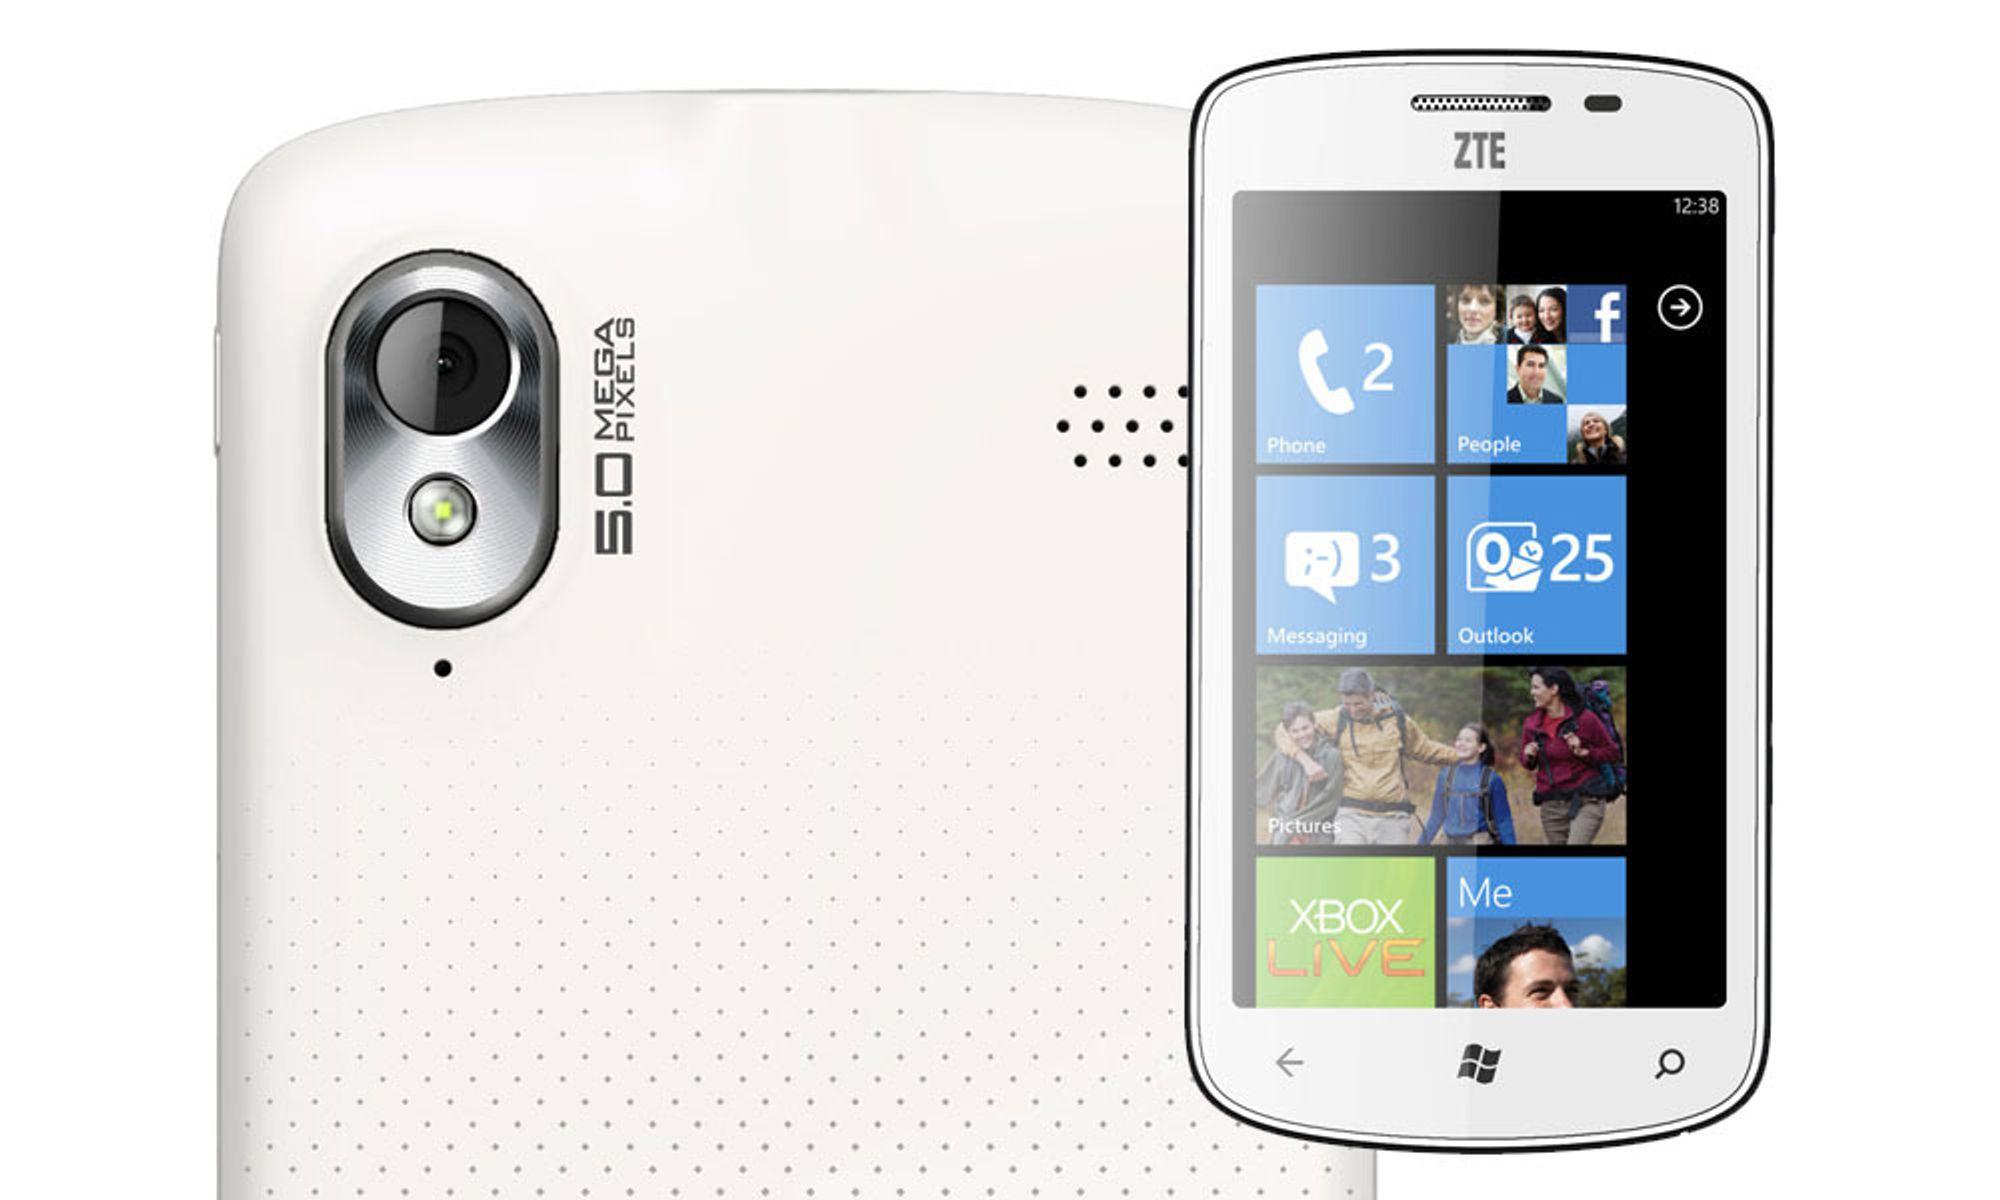 - Betaler Microsoft 140 - 180 kroner per Windows-telefon